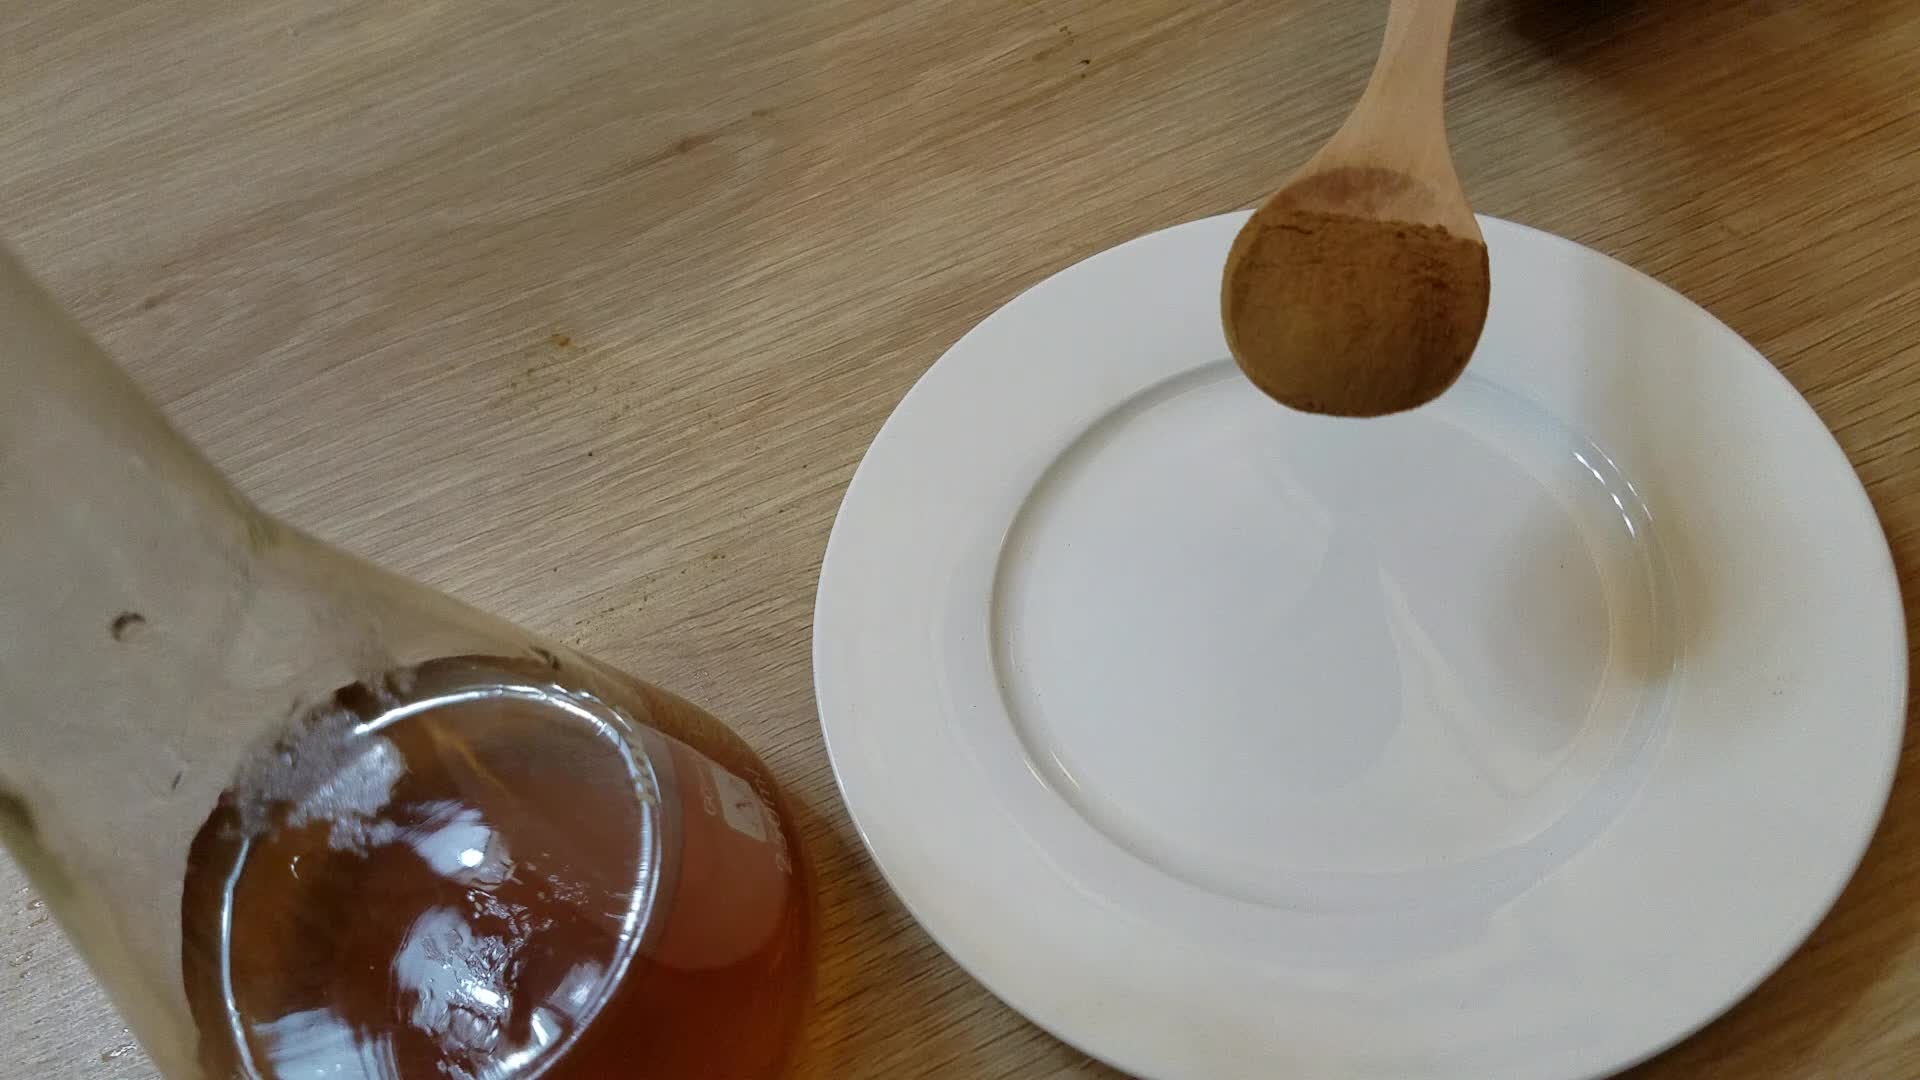 Fonte direta da fábrica natural extrato de pueraria puerarin 40% em pó a granel